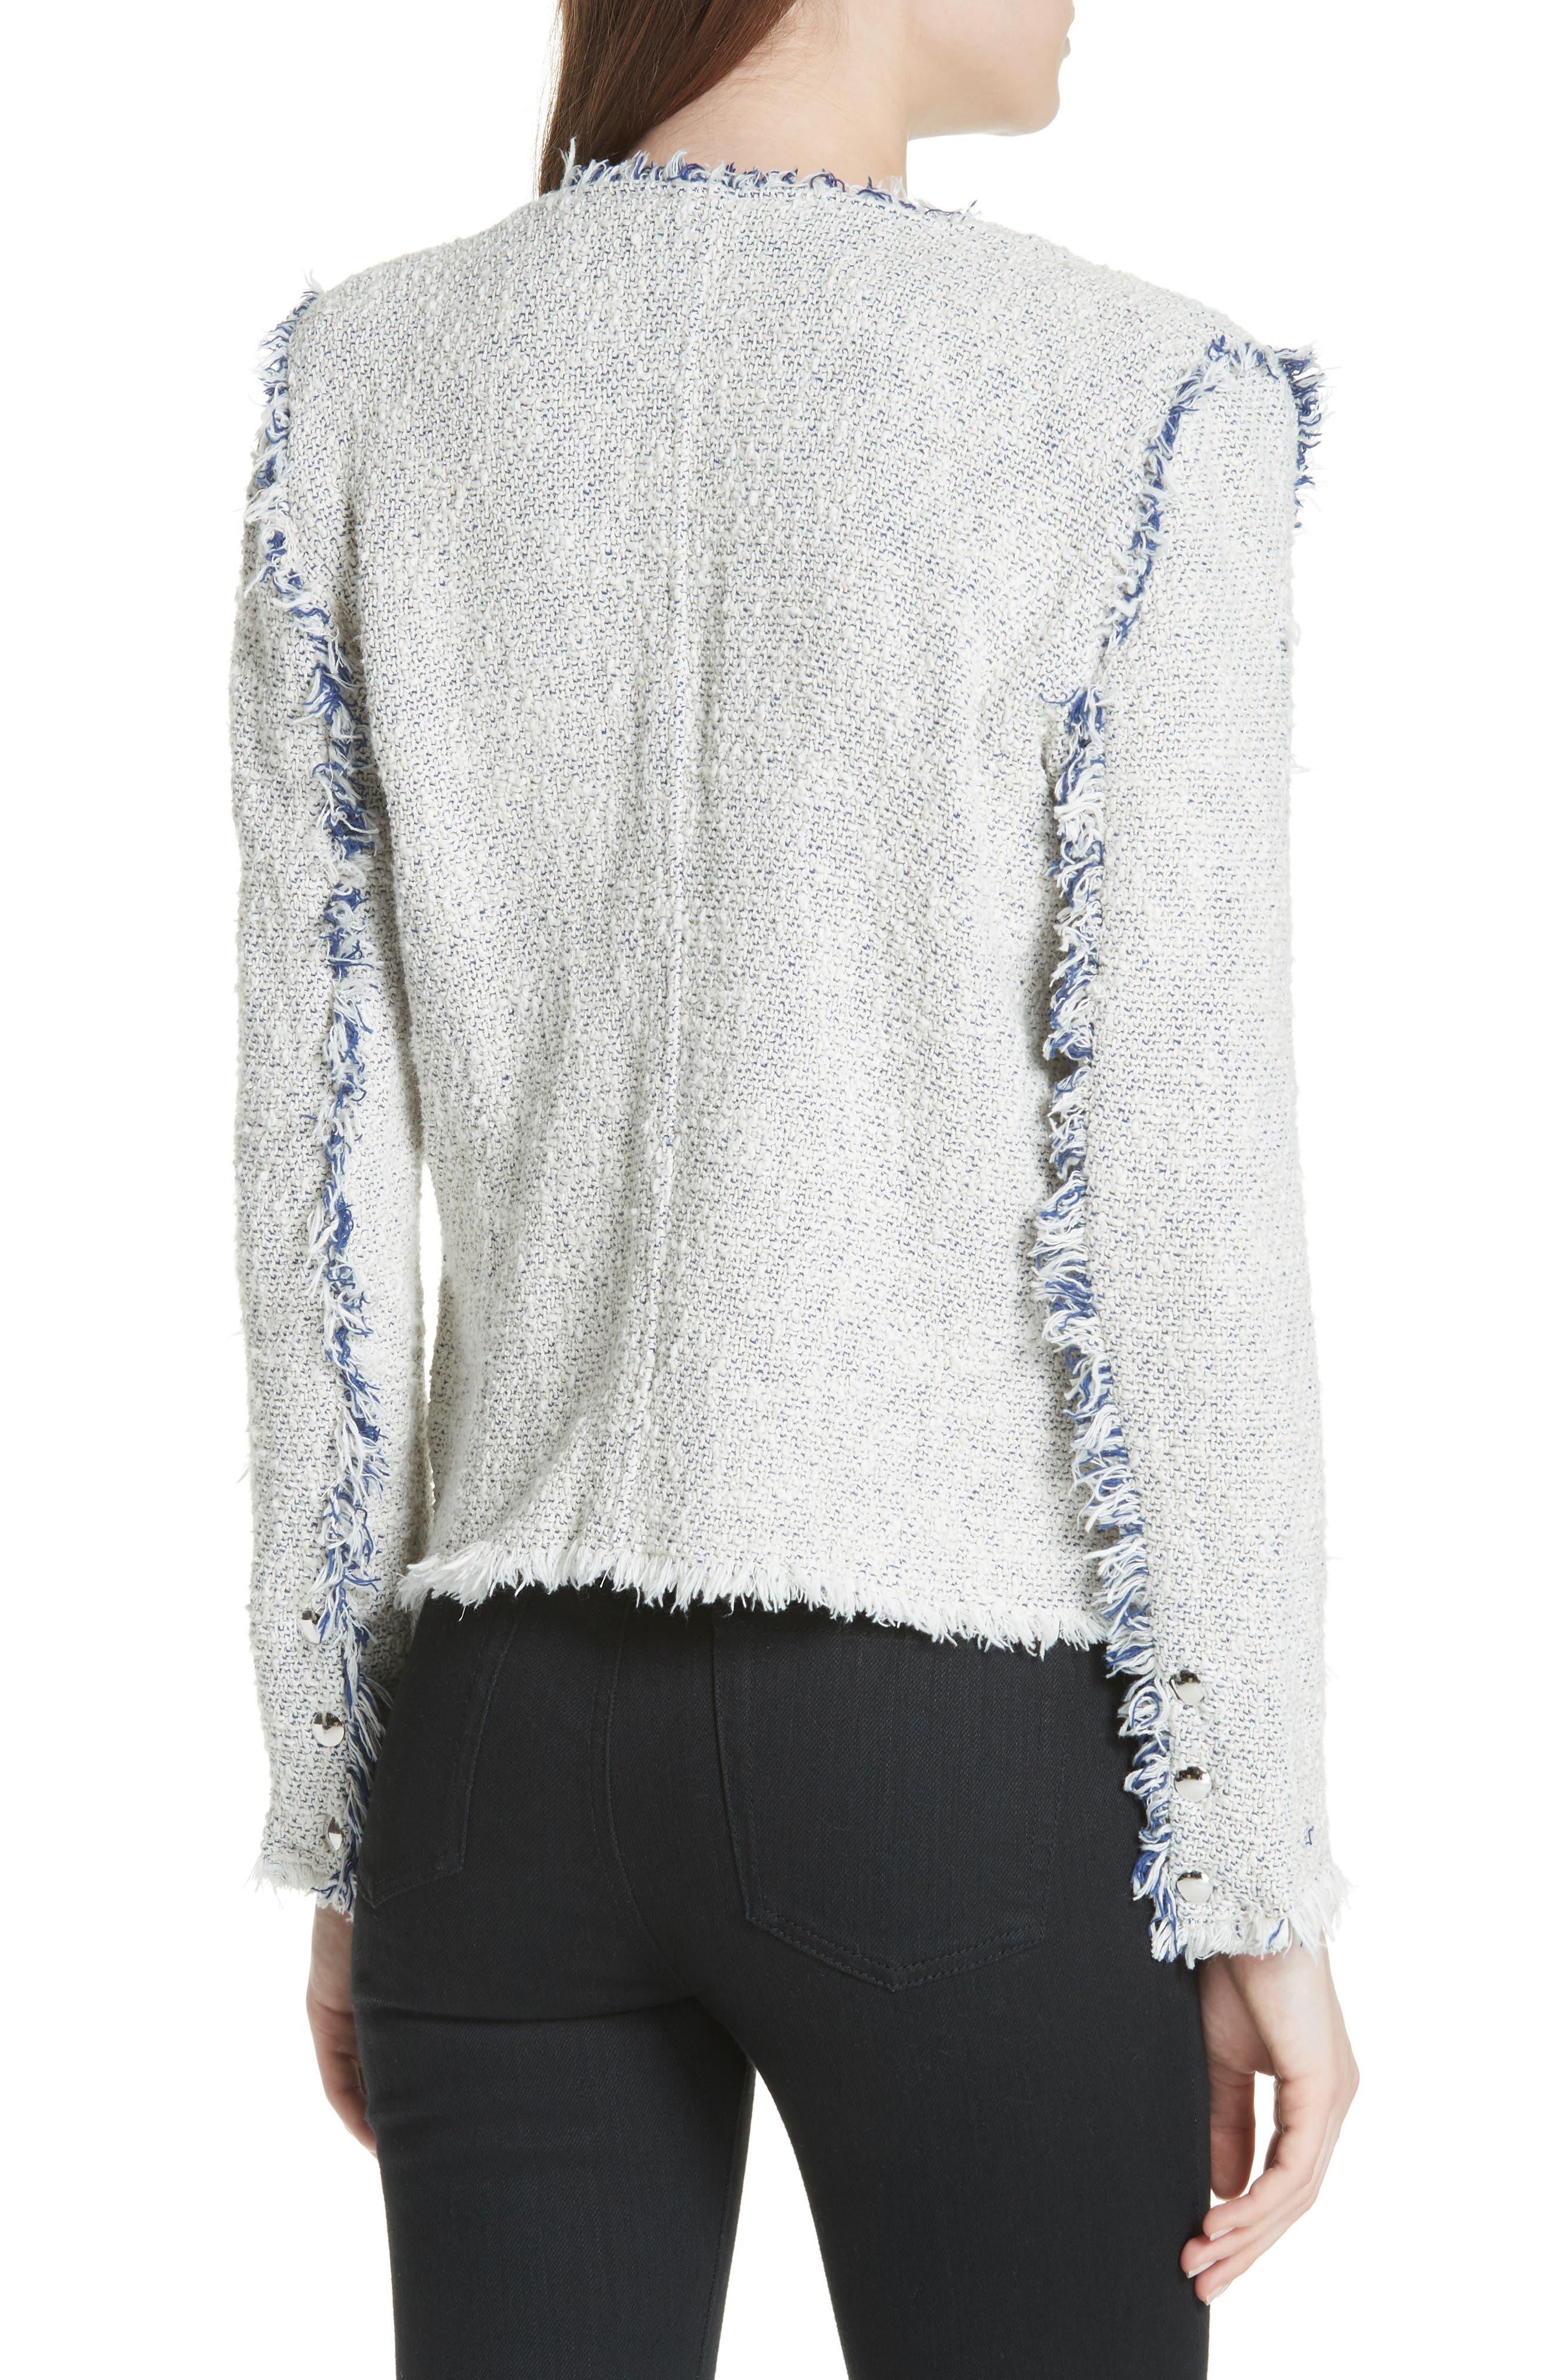 'Agnette' Tweed Jacket,                             Alternate thumbnail 2, color,                             White/ Blue